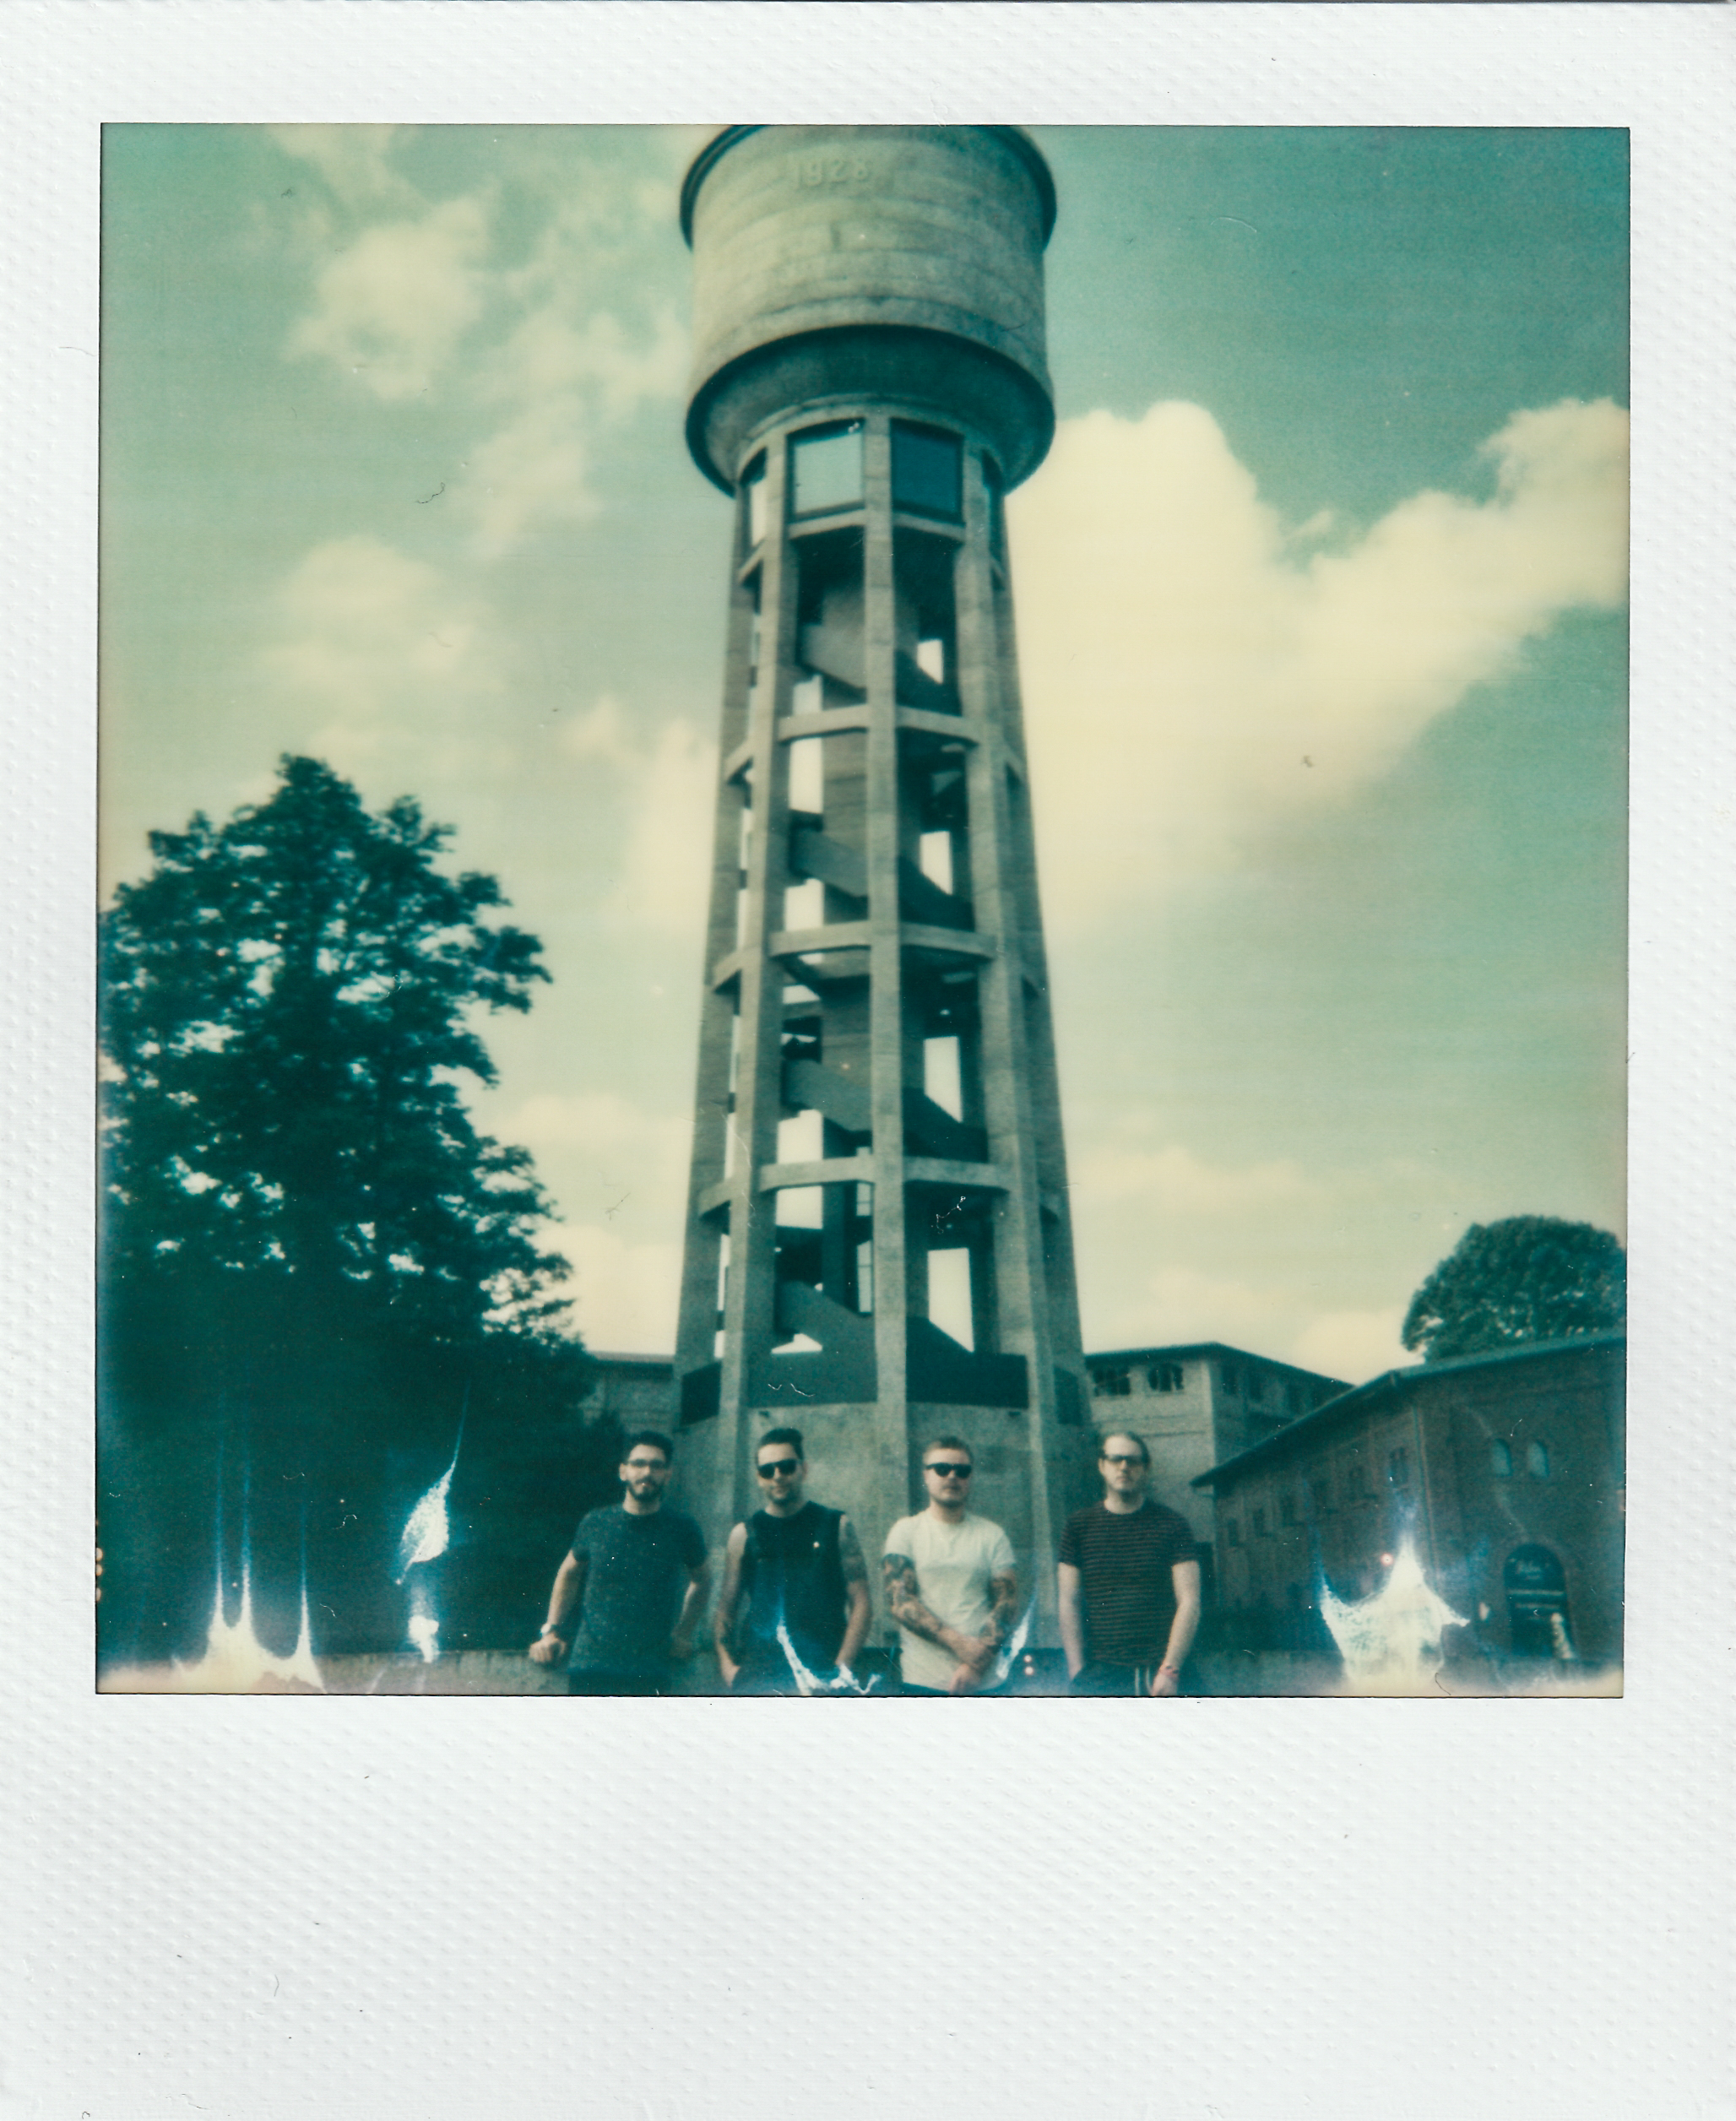 Glass Peaks - Lux Polaroids - 17.06.2017 - Ant Adams-1.jpg